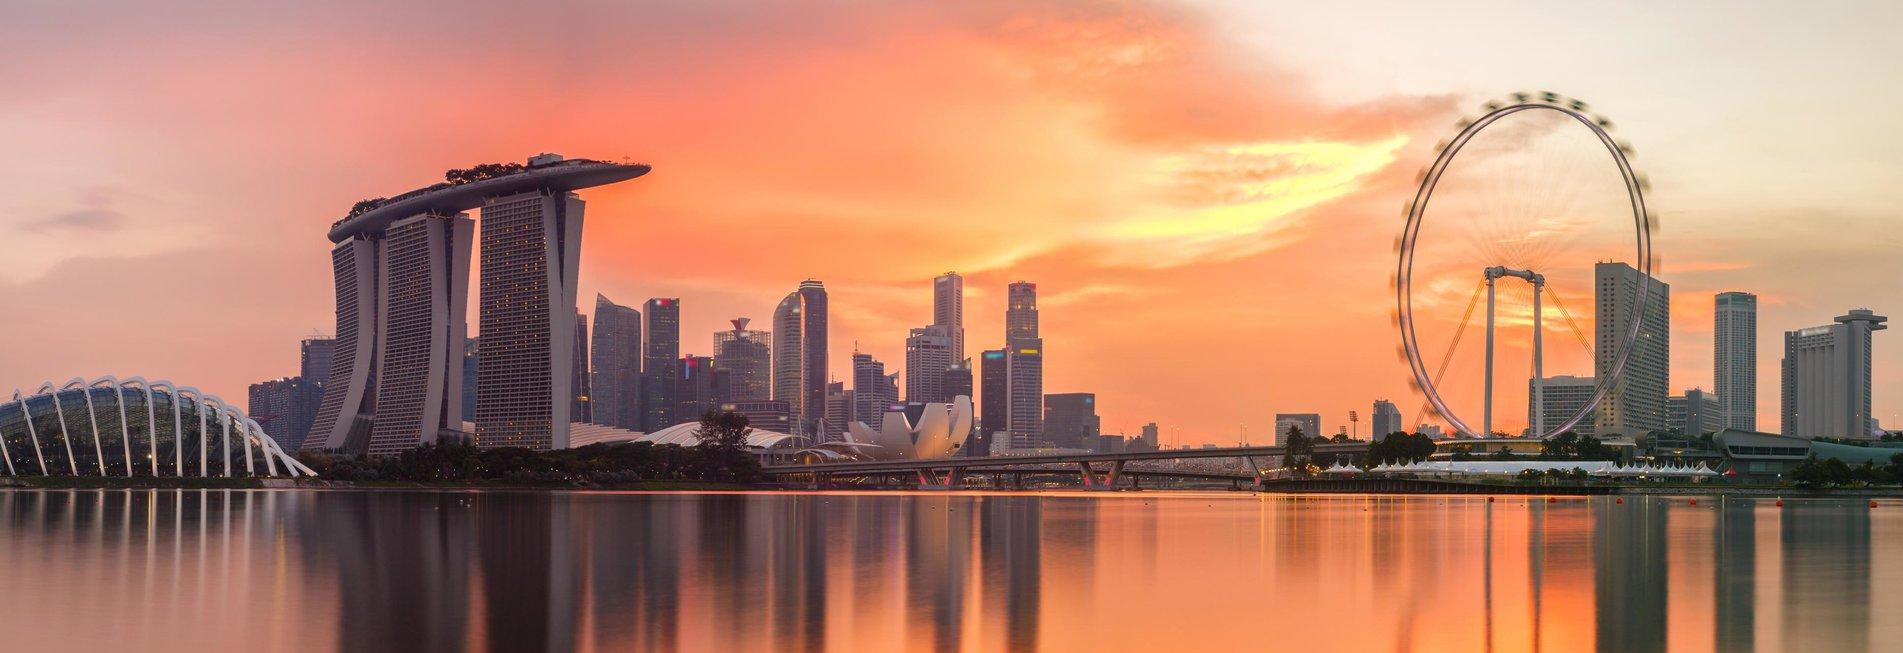 Kreuzfahrt - Norwegian Spirit: Von Singapur nach Yokohama